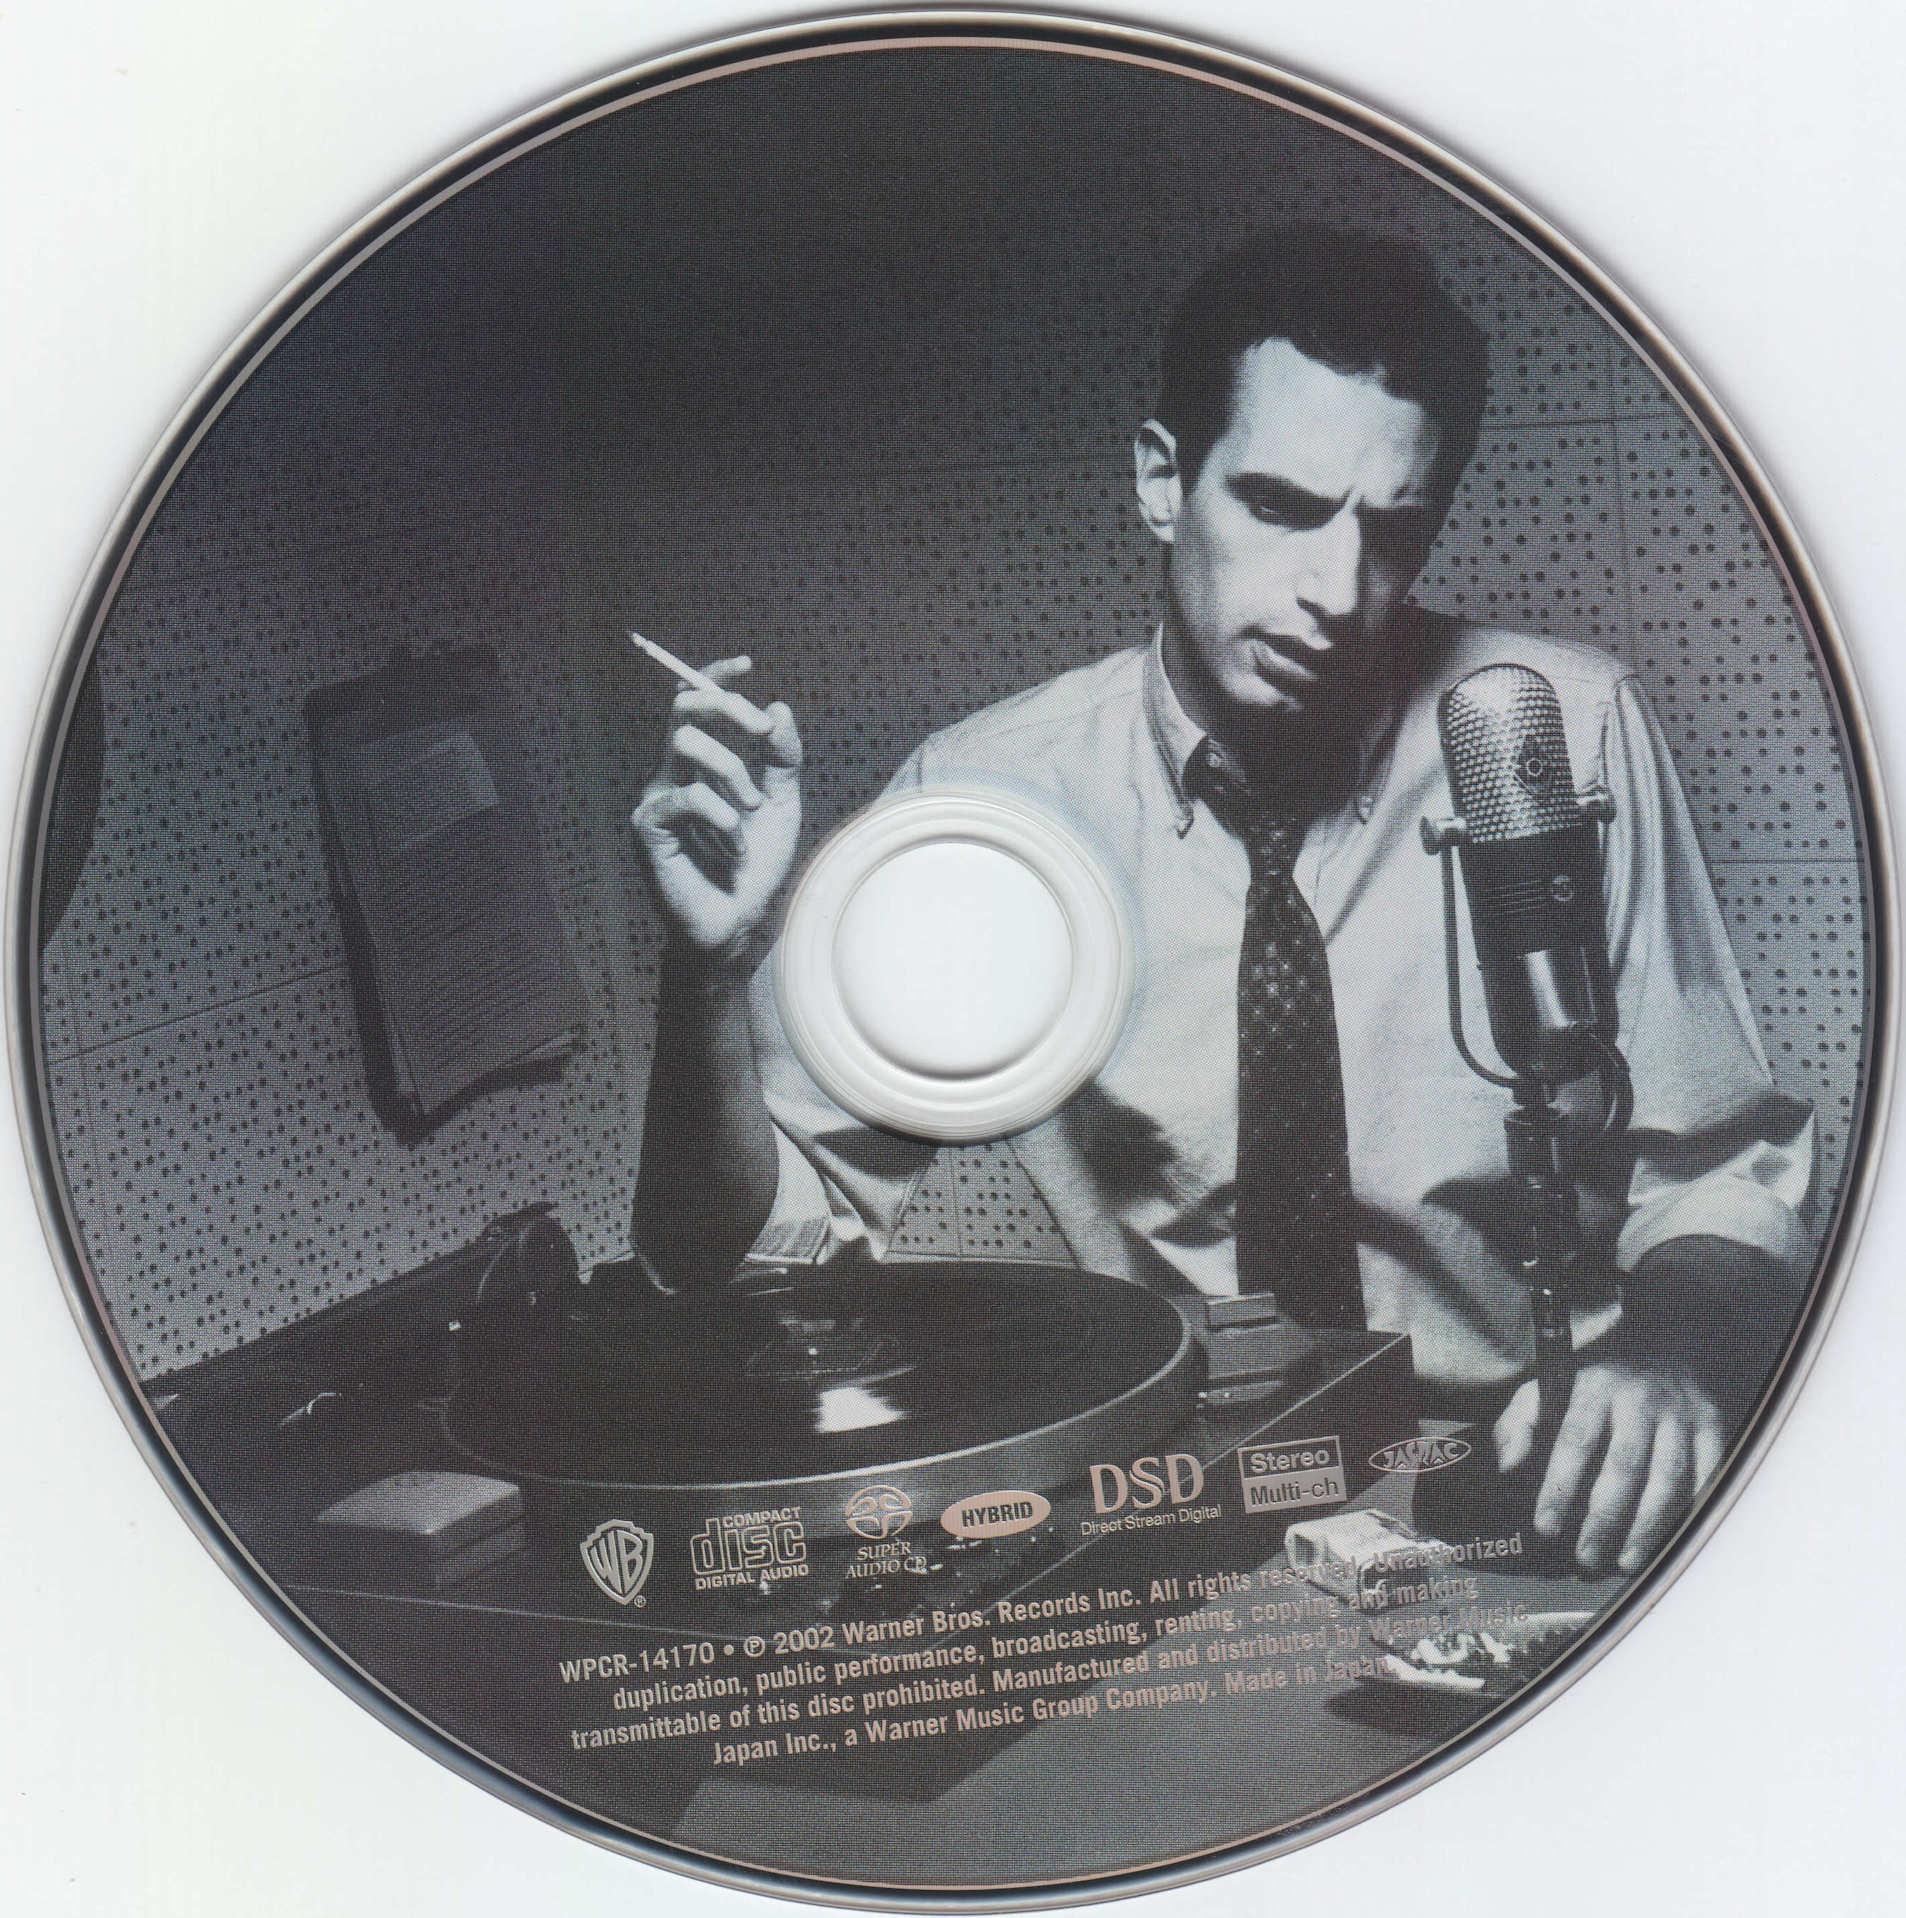 Album art exchange nightfly trilogy (box set) by donald fagen.